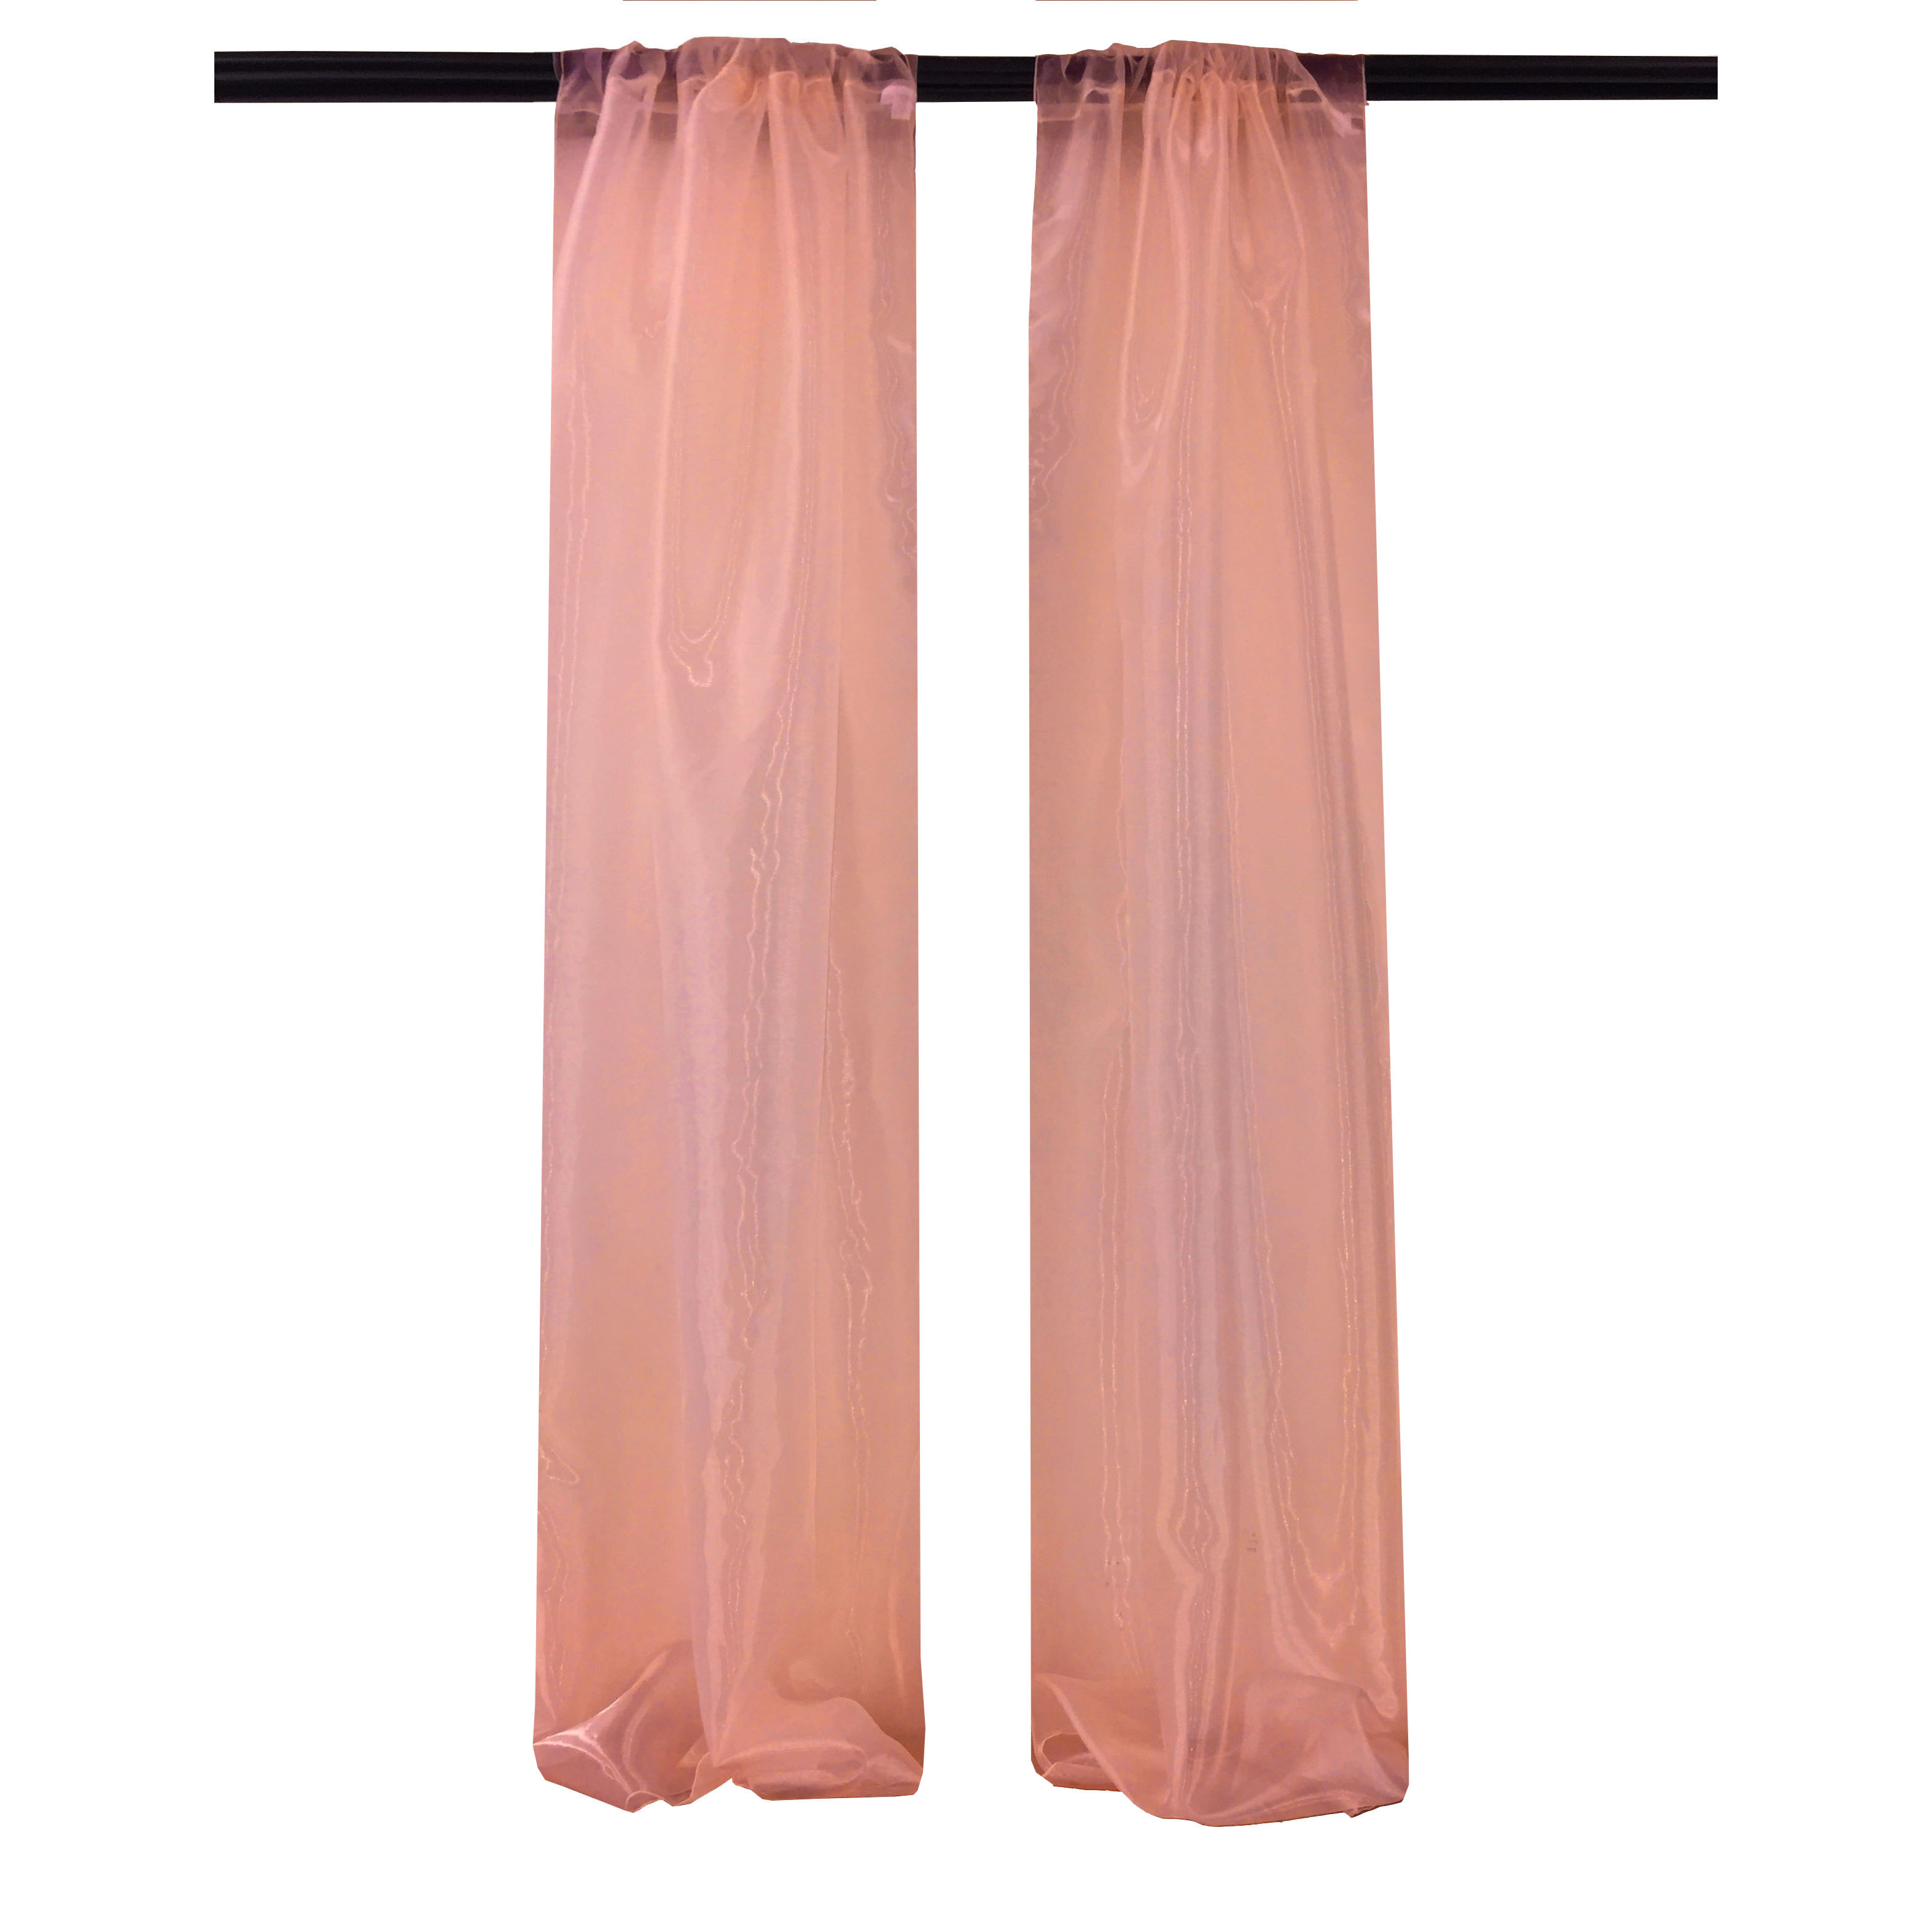 Mirror organza Sheer Coral Curtain Drape Panel BackDrop  Made in the USA  party decor